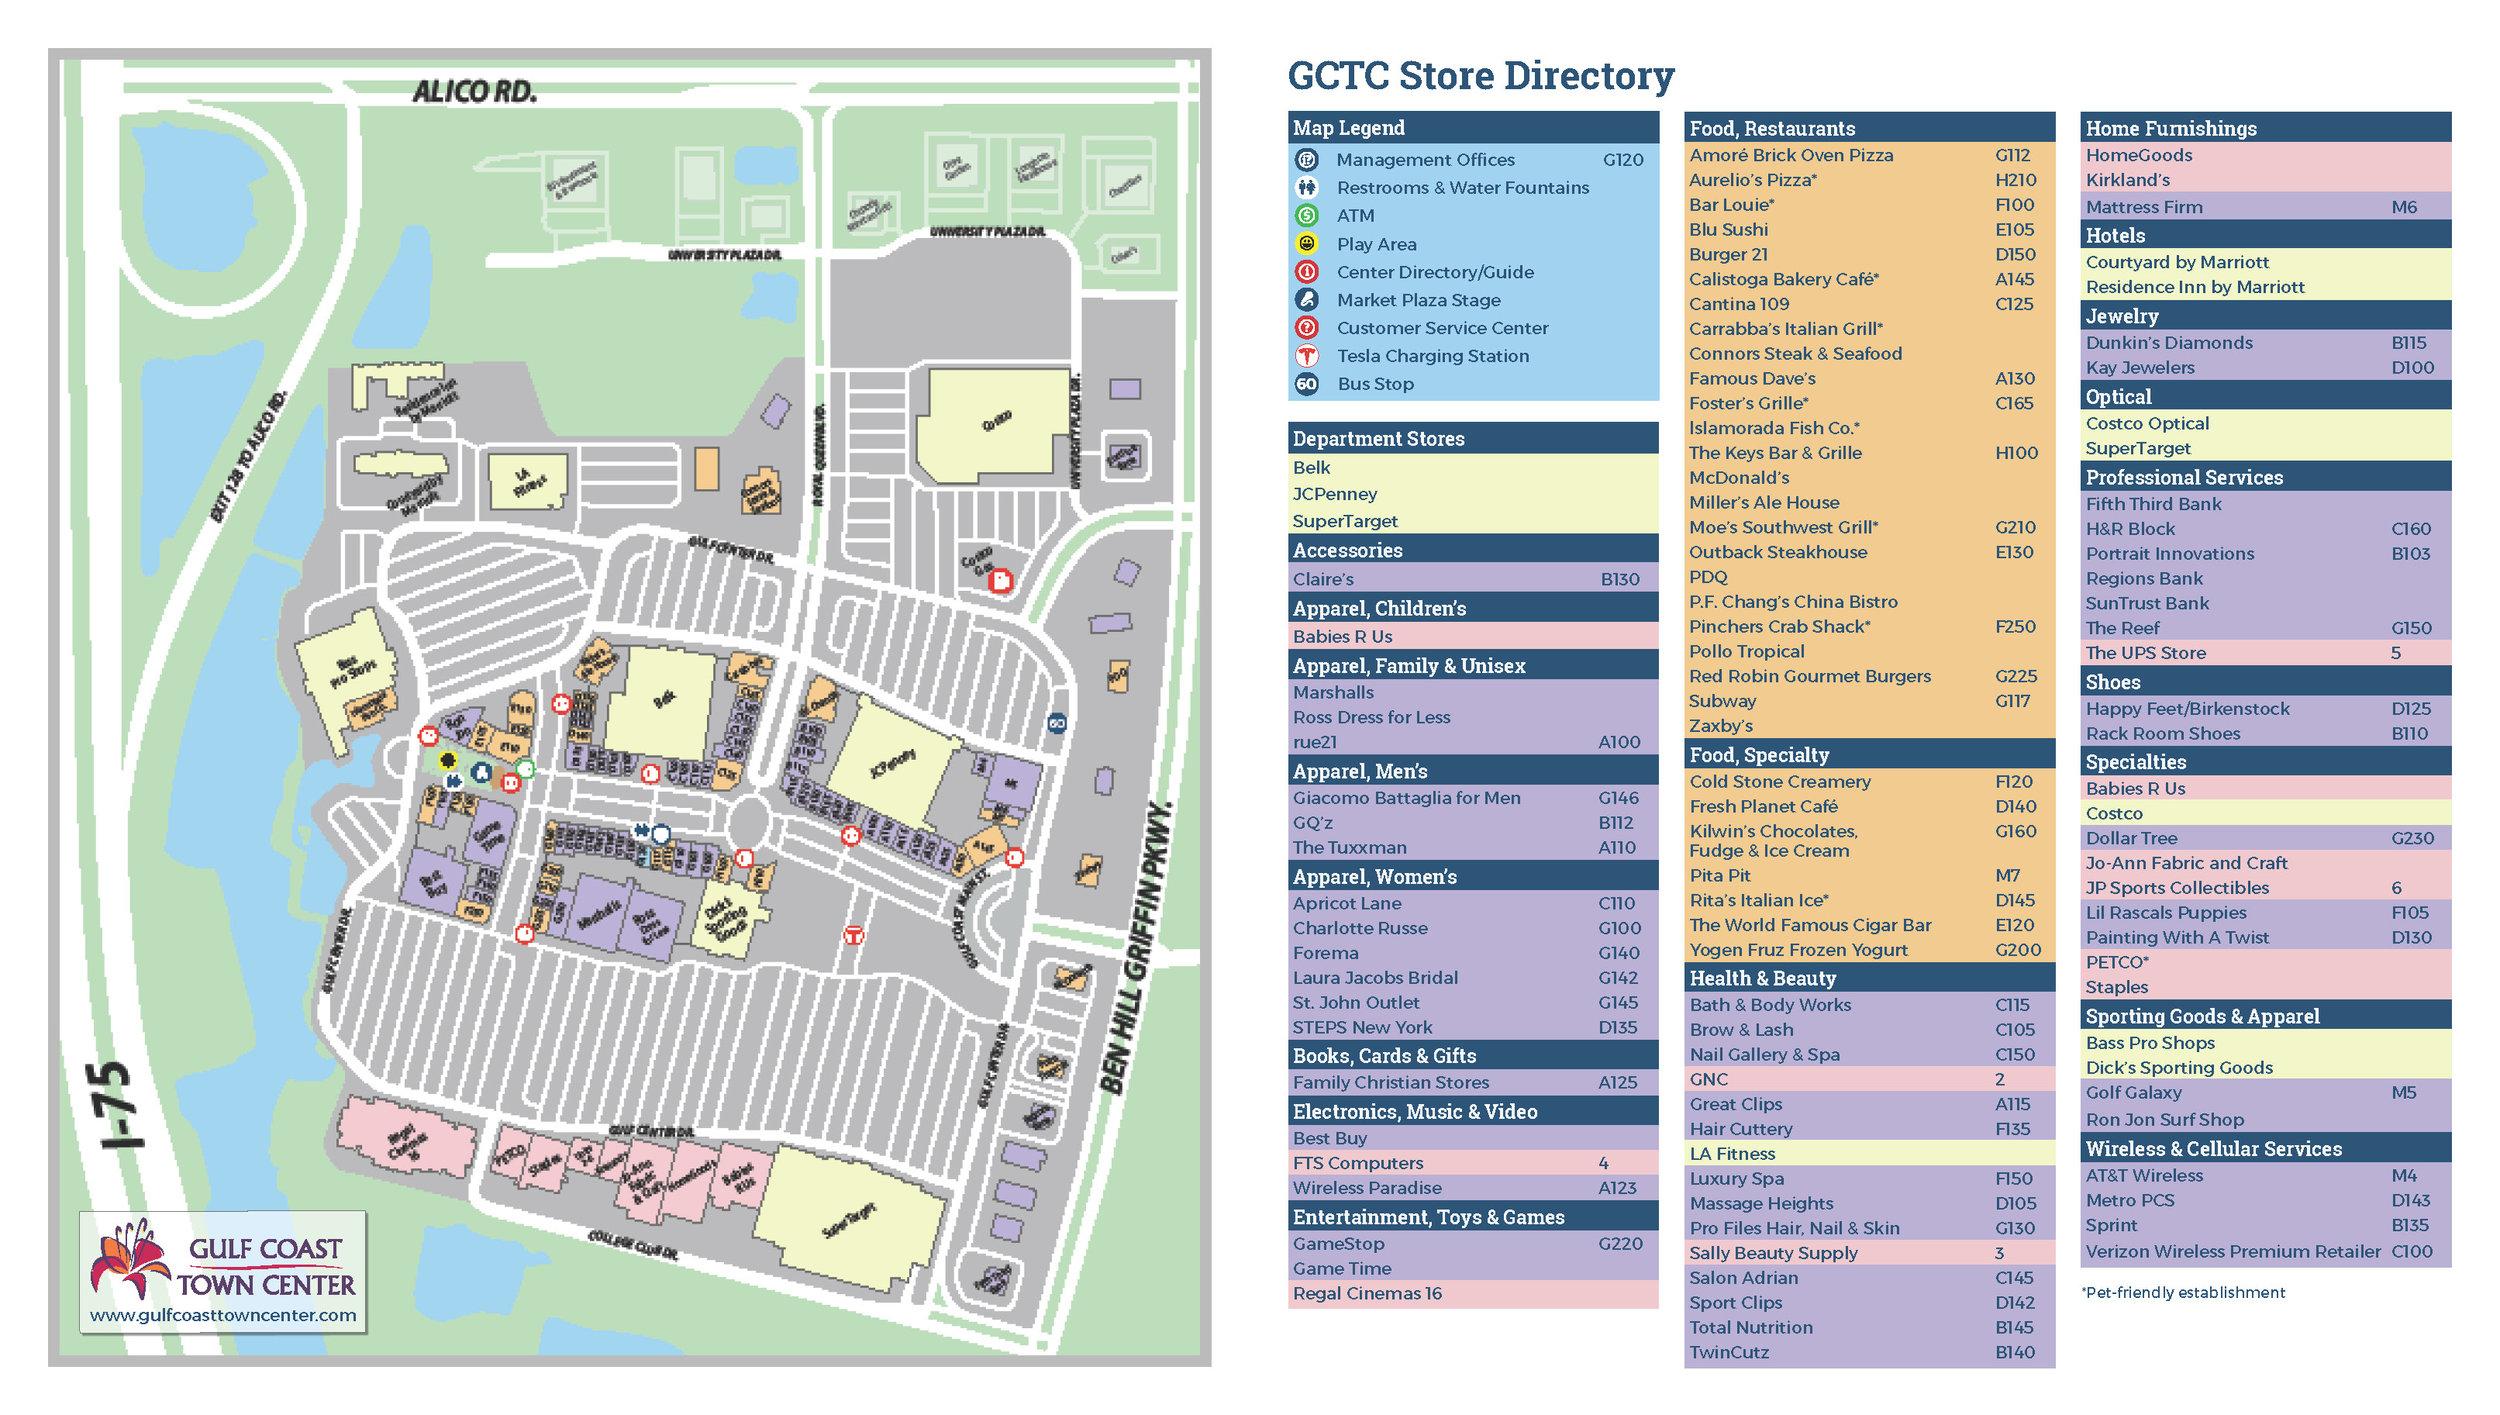 20160330 GCTC Facility Brochure+Map-PR-nomarks_Page_2 (1).jpg